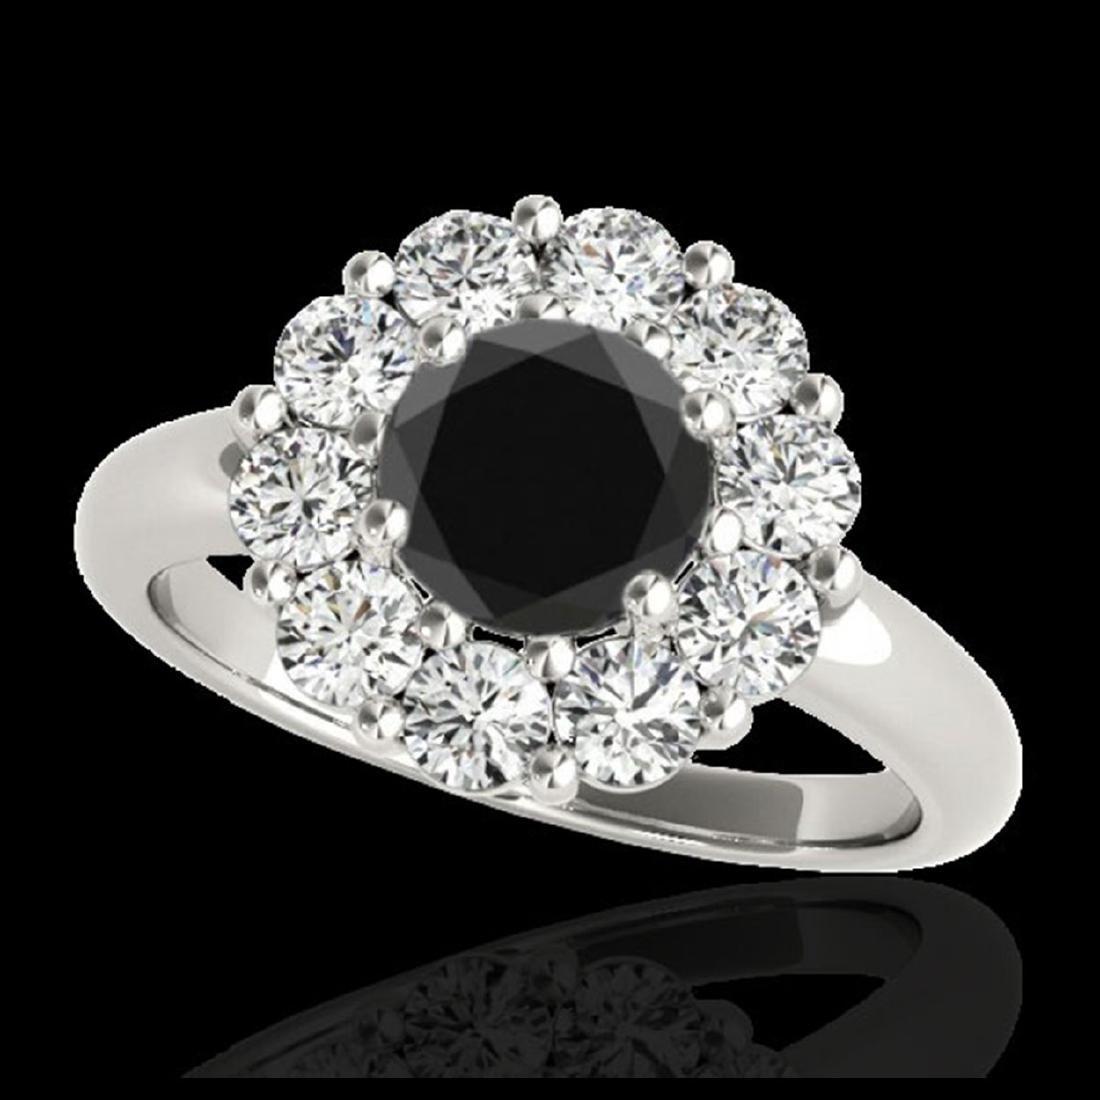 2.85 ctw VS Black Diamond Solitaire Halo Ring 10K White